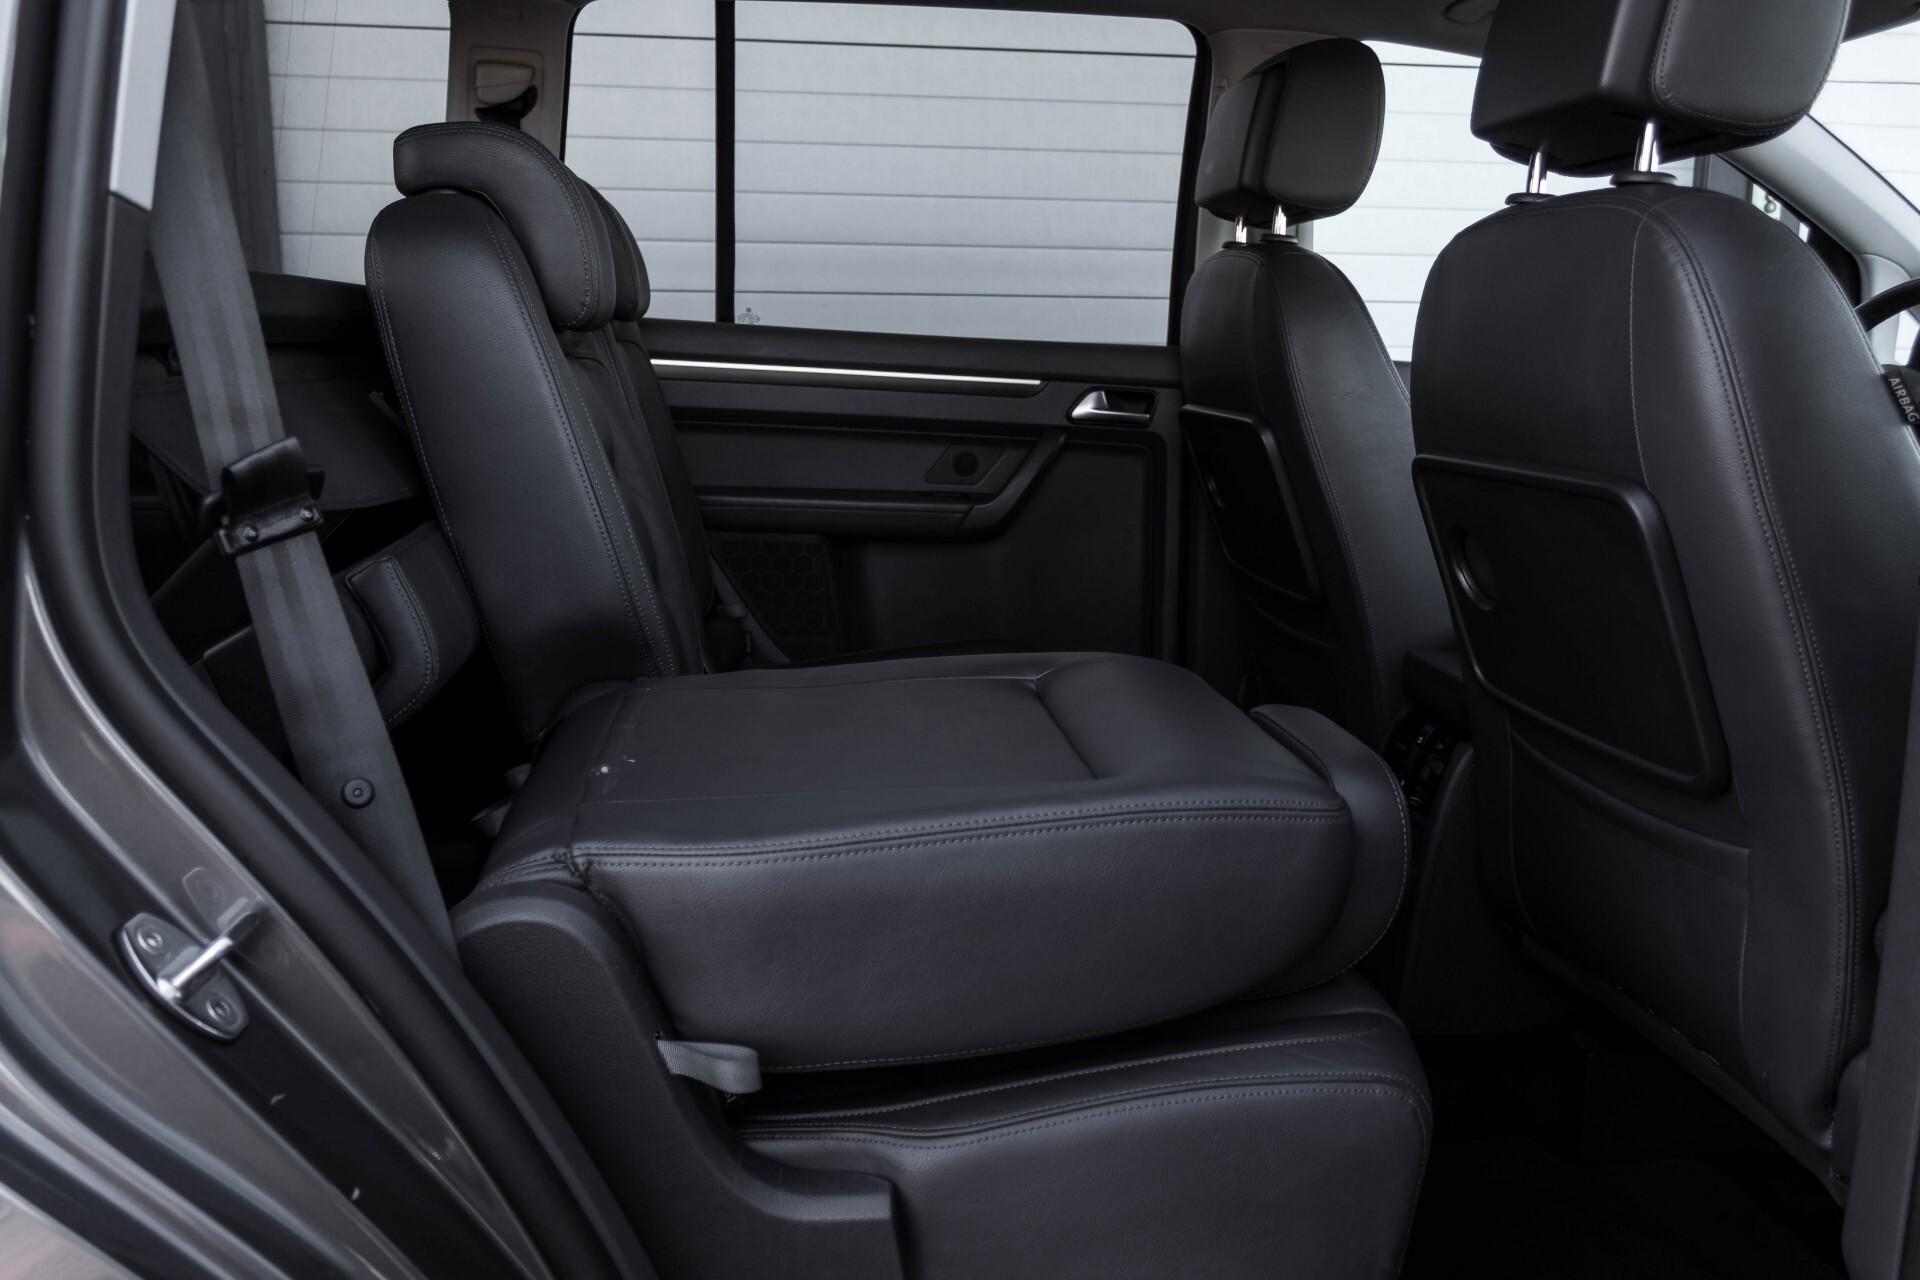 Volkswagen Touran 2.0 TDI Highline 7Persoons 177pk Panorama/Leder/Navi/Camera/Verw-Stln/Trhk/ECC/Xenon Aut Foto 5